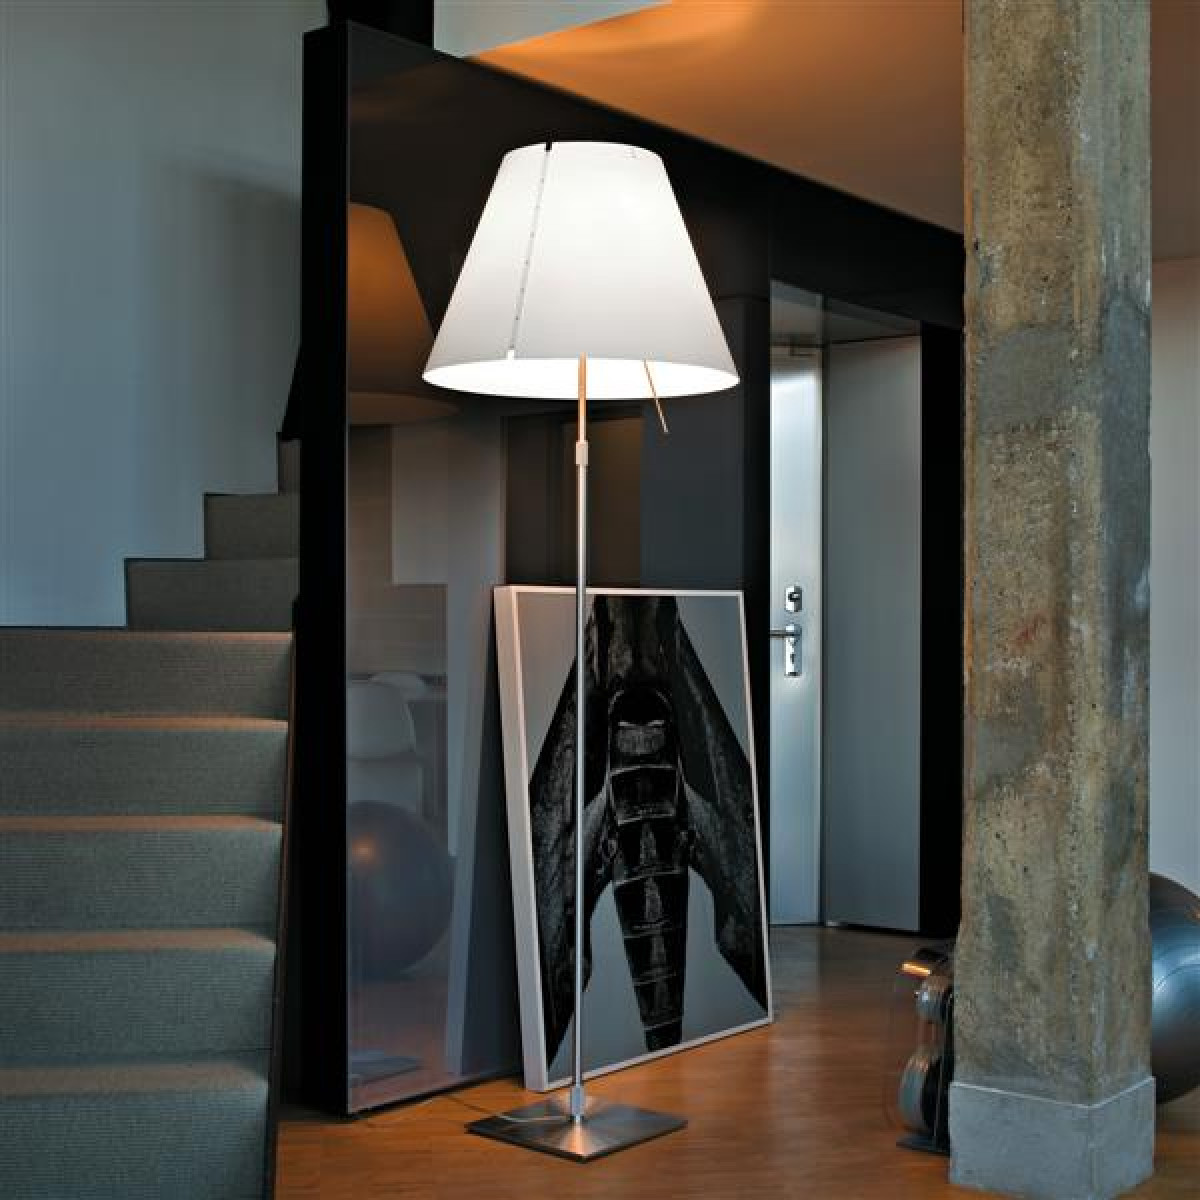 luceplan grande costanza d13g stehleuchte casa de. Black Bedroom Furniture Sets. Home Design Ideas